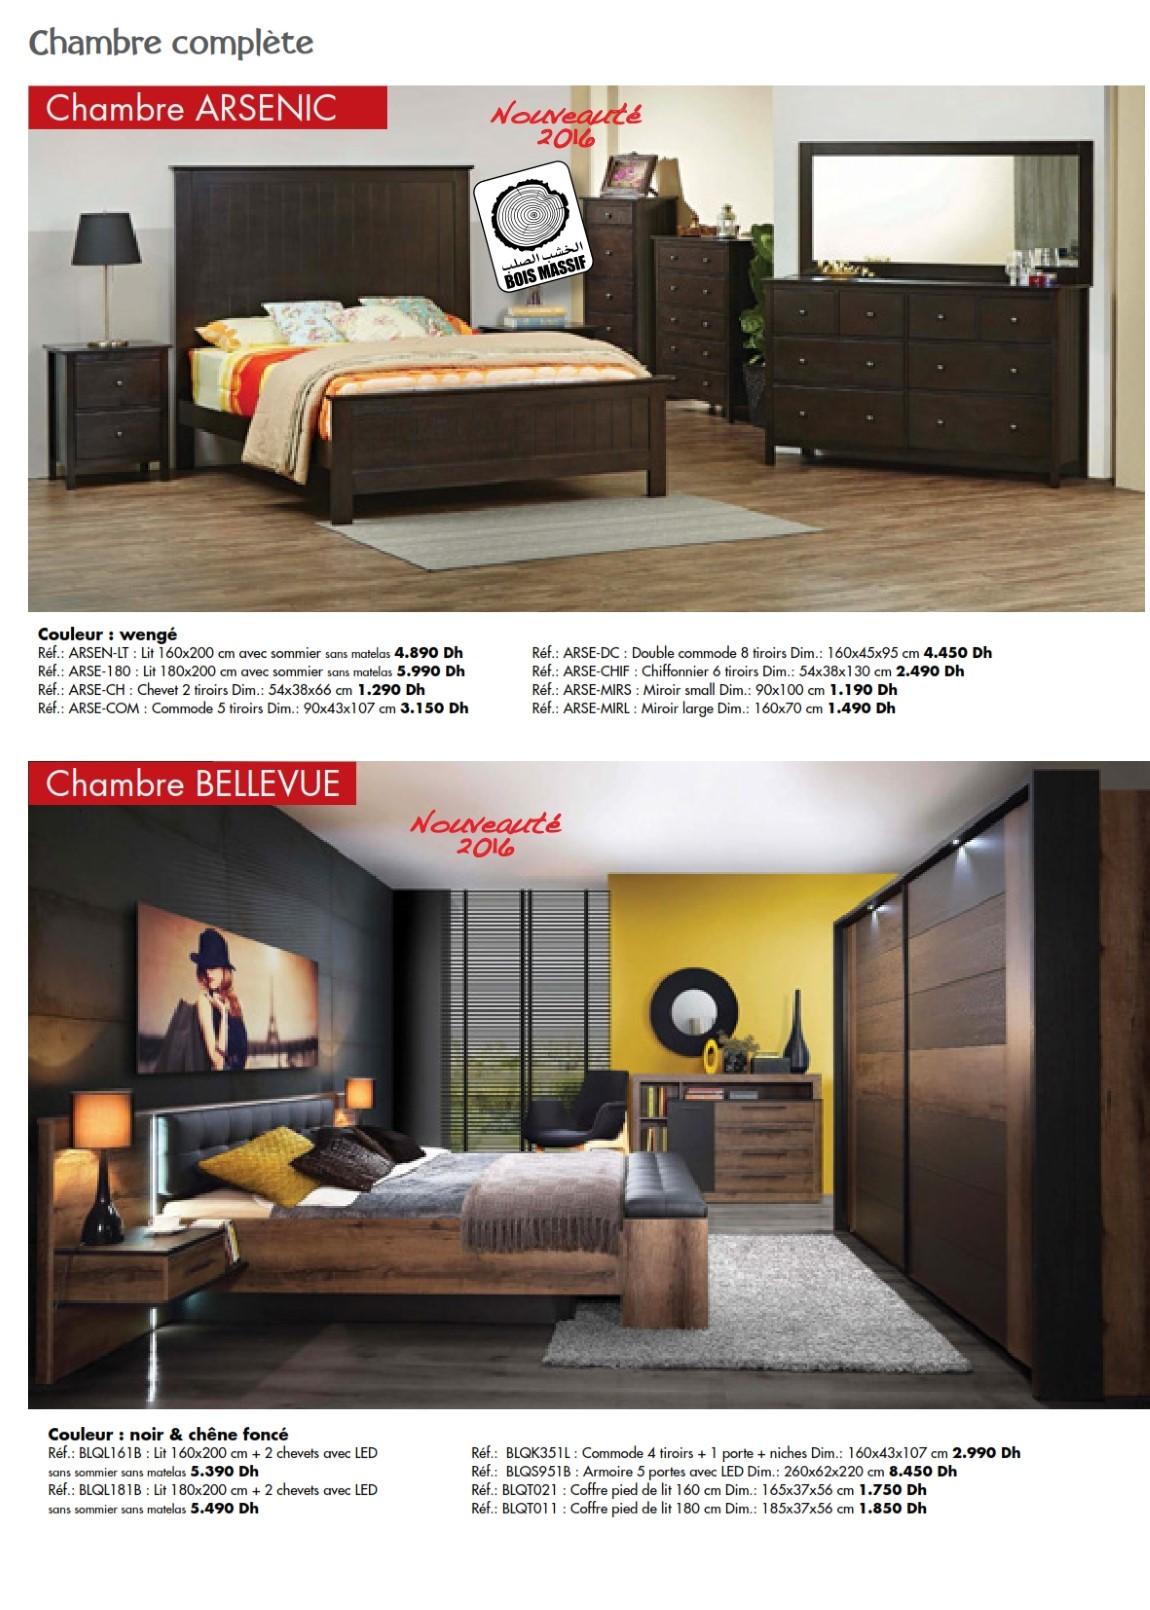 Awesome Chambre A Coucher 2016 2 Ideas - House Design - marcomilone.com